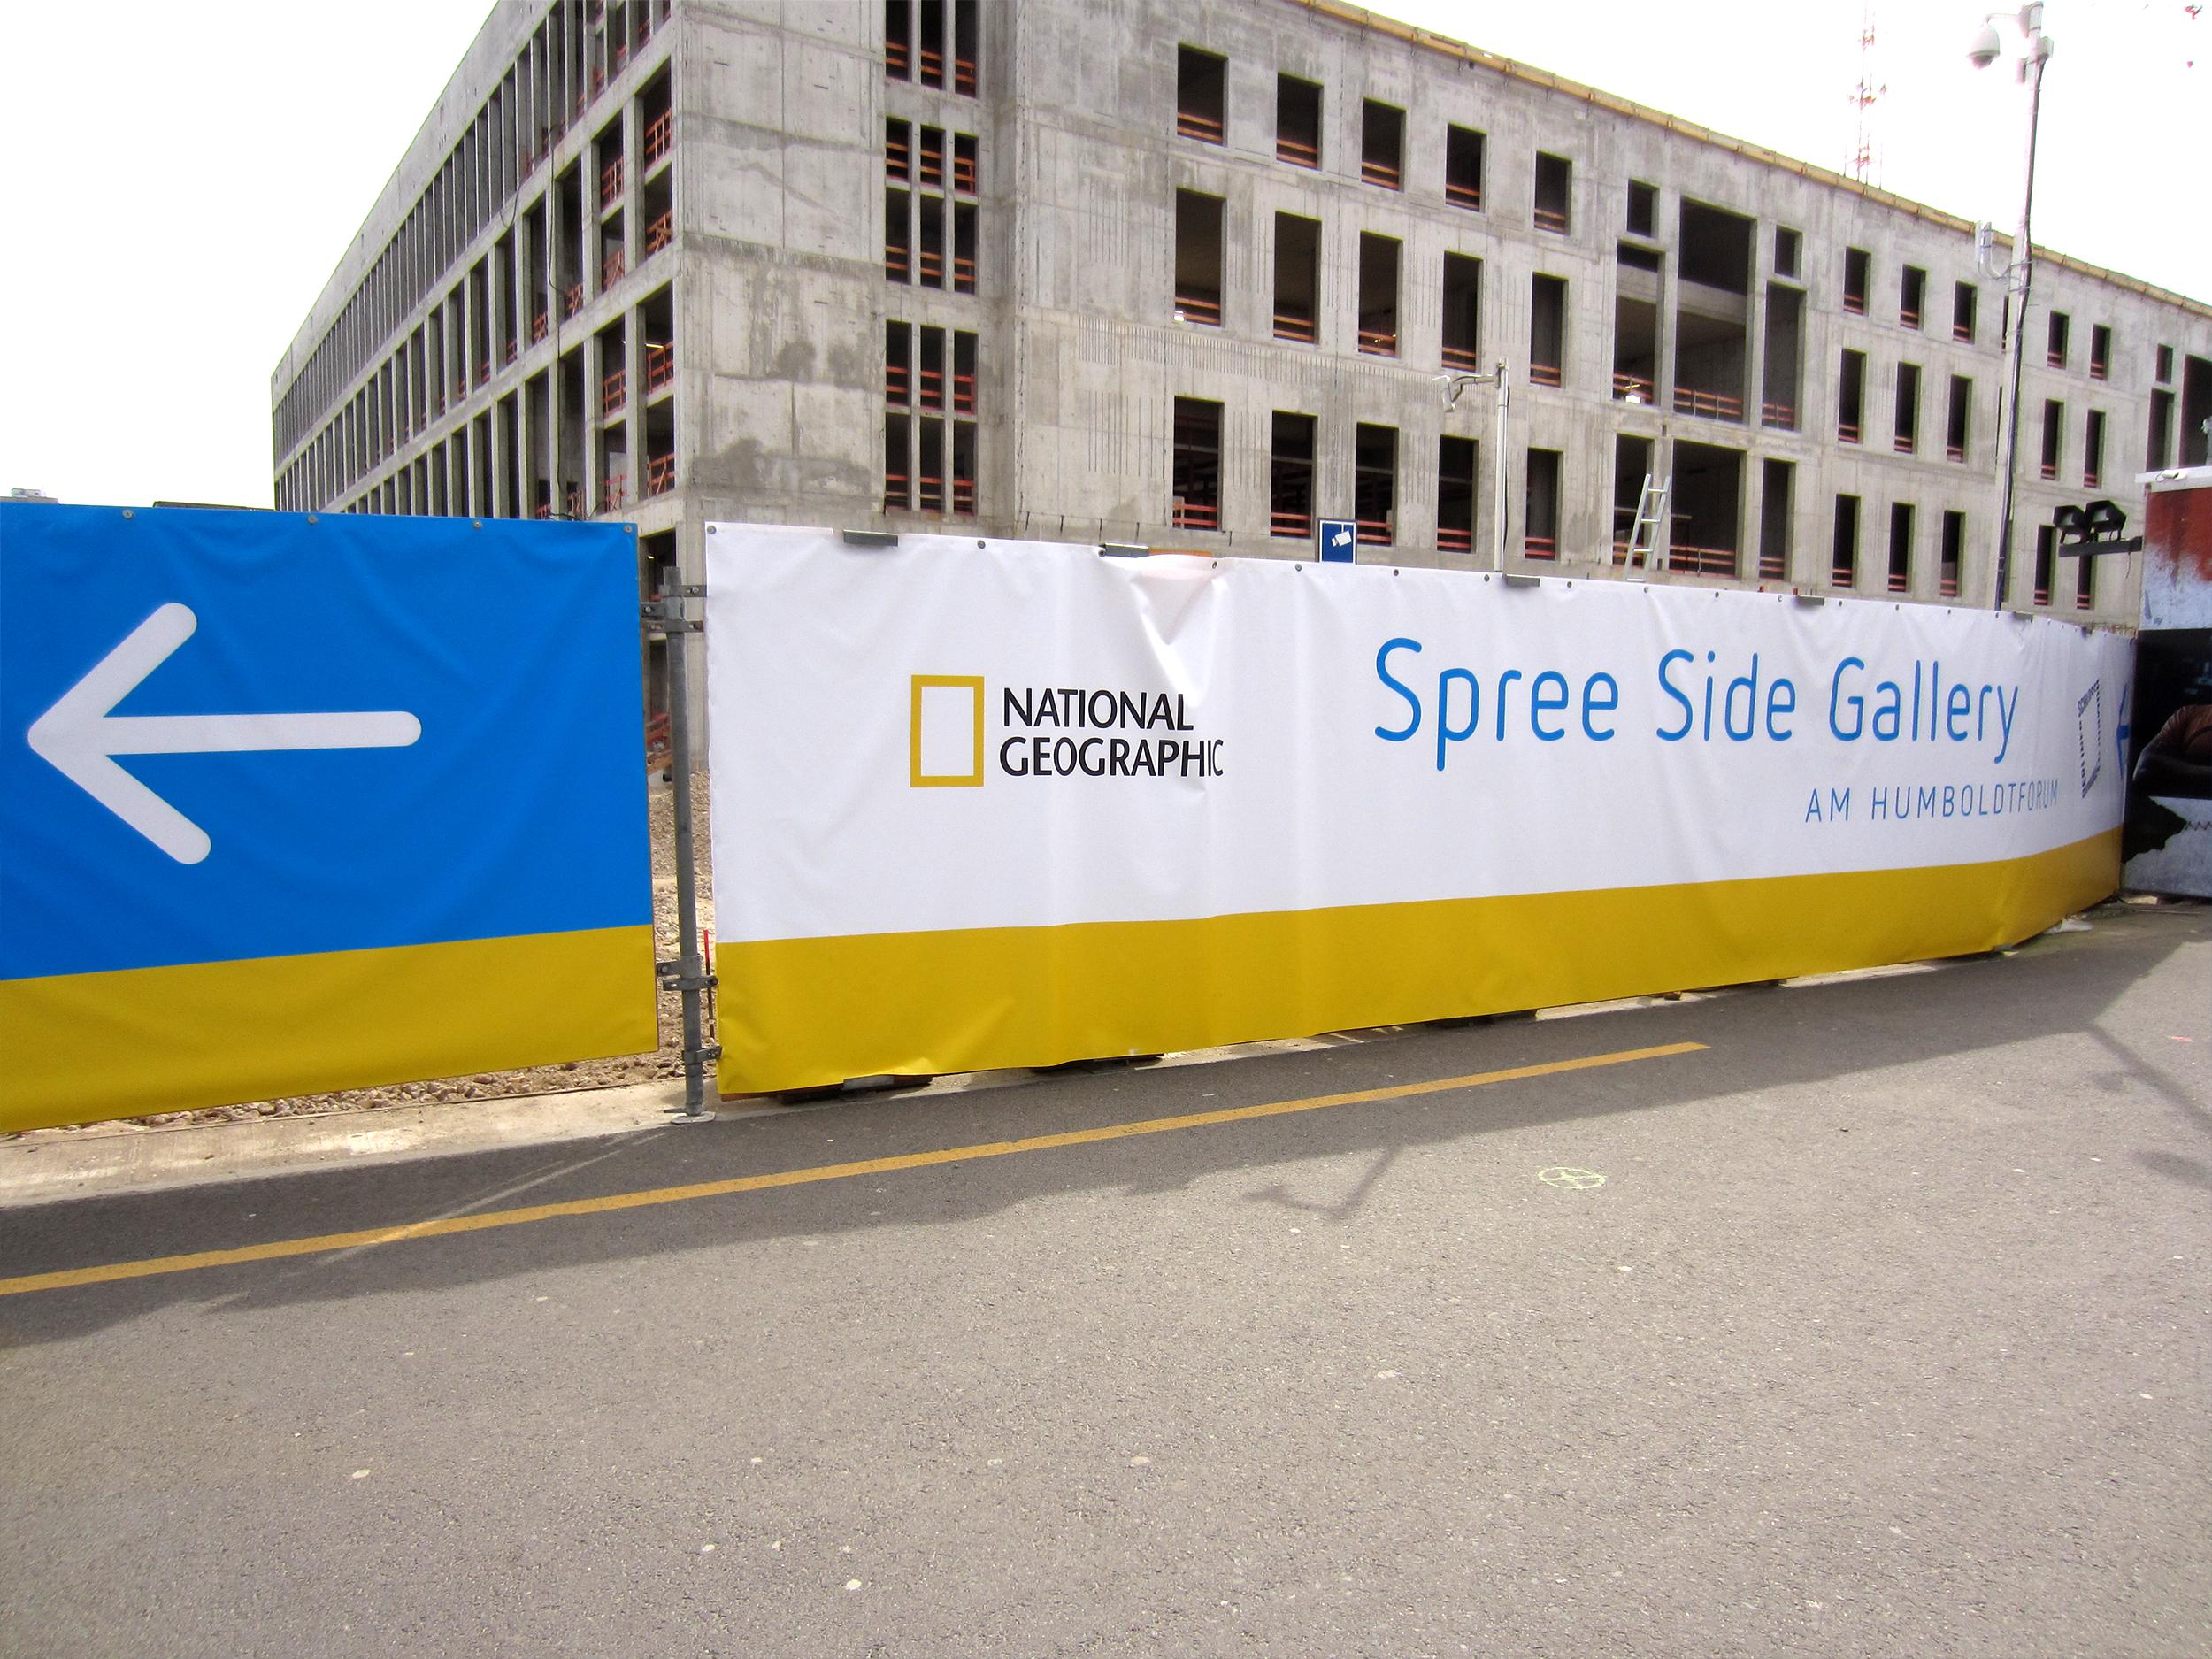 Spreeside Gallery Leitsystem